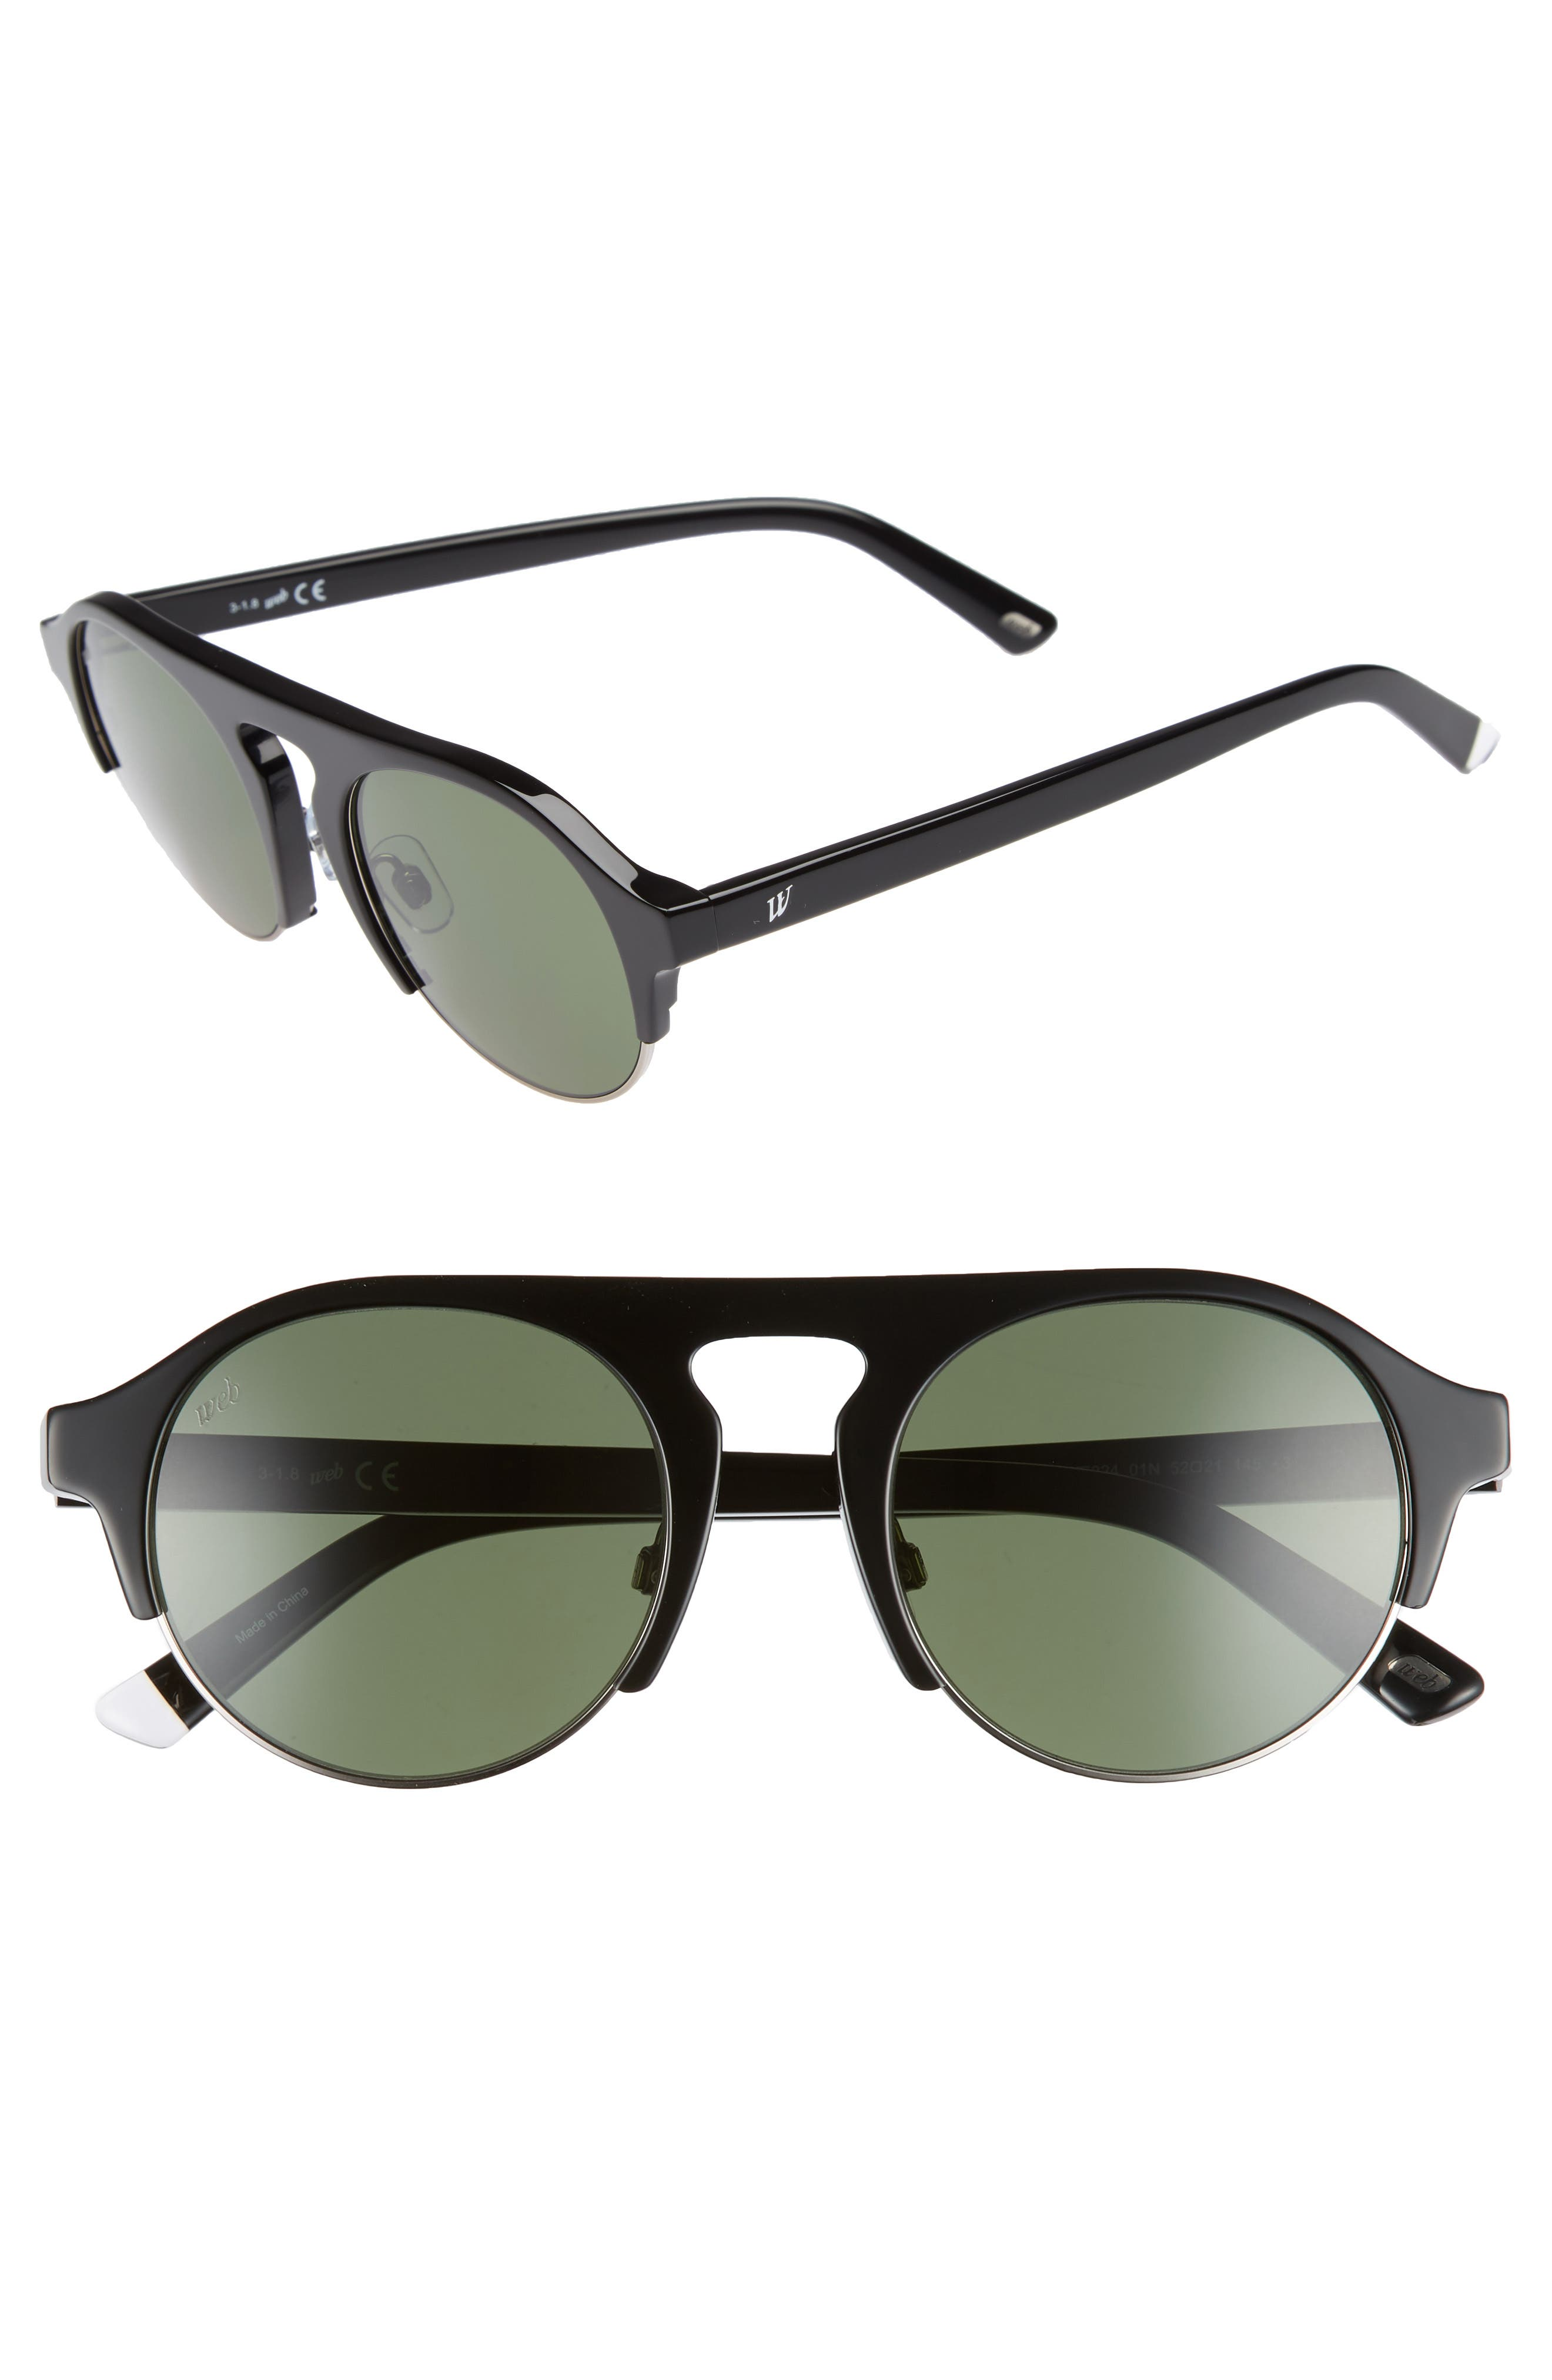 52mm Sunglasses,                             Main thumbnail 1, color,                             SHINY BLACK/ GREEN